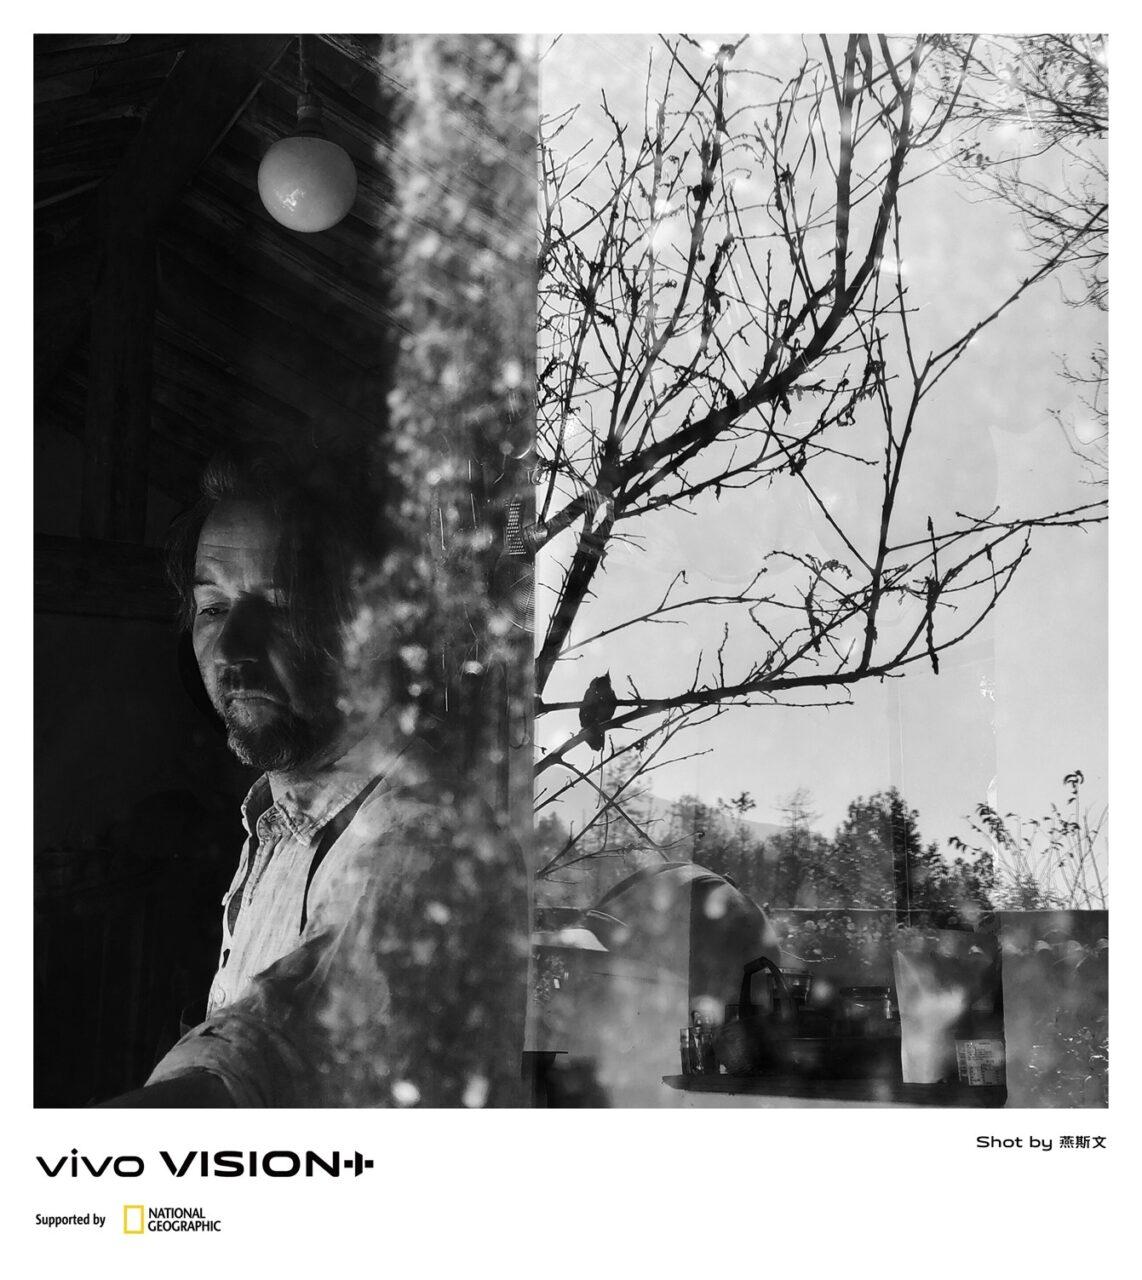 "Shot by首期""vivo影像+大师实践课""学员燕斯文"